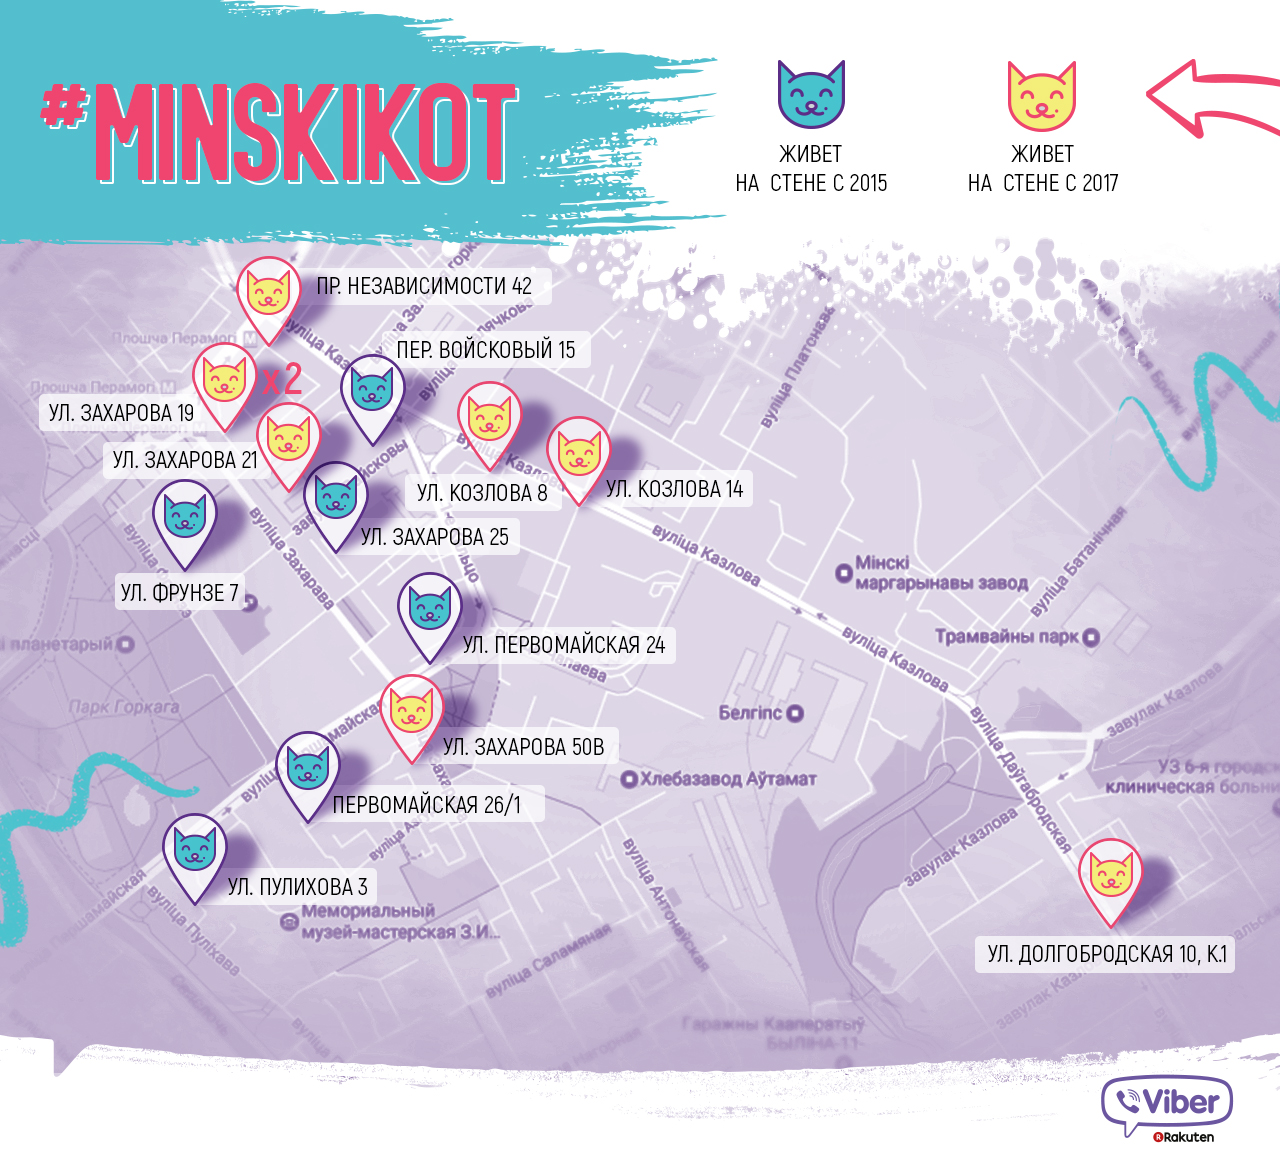 #Minskikot выпустил карту с героями известного граффити